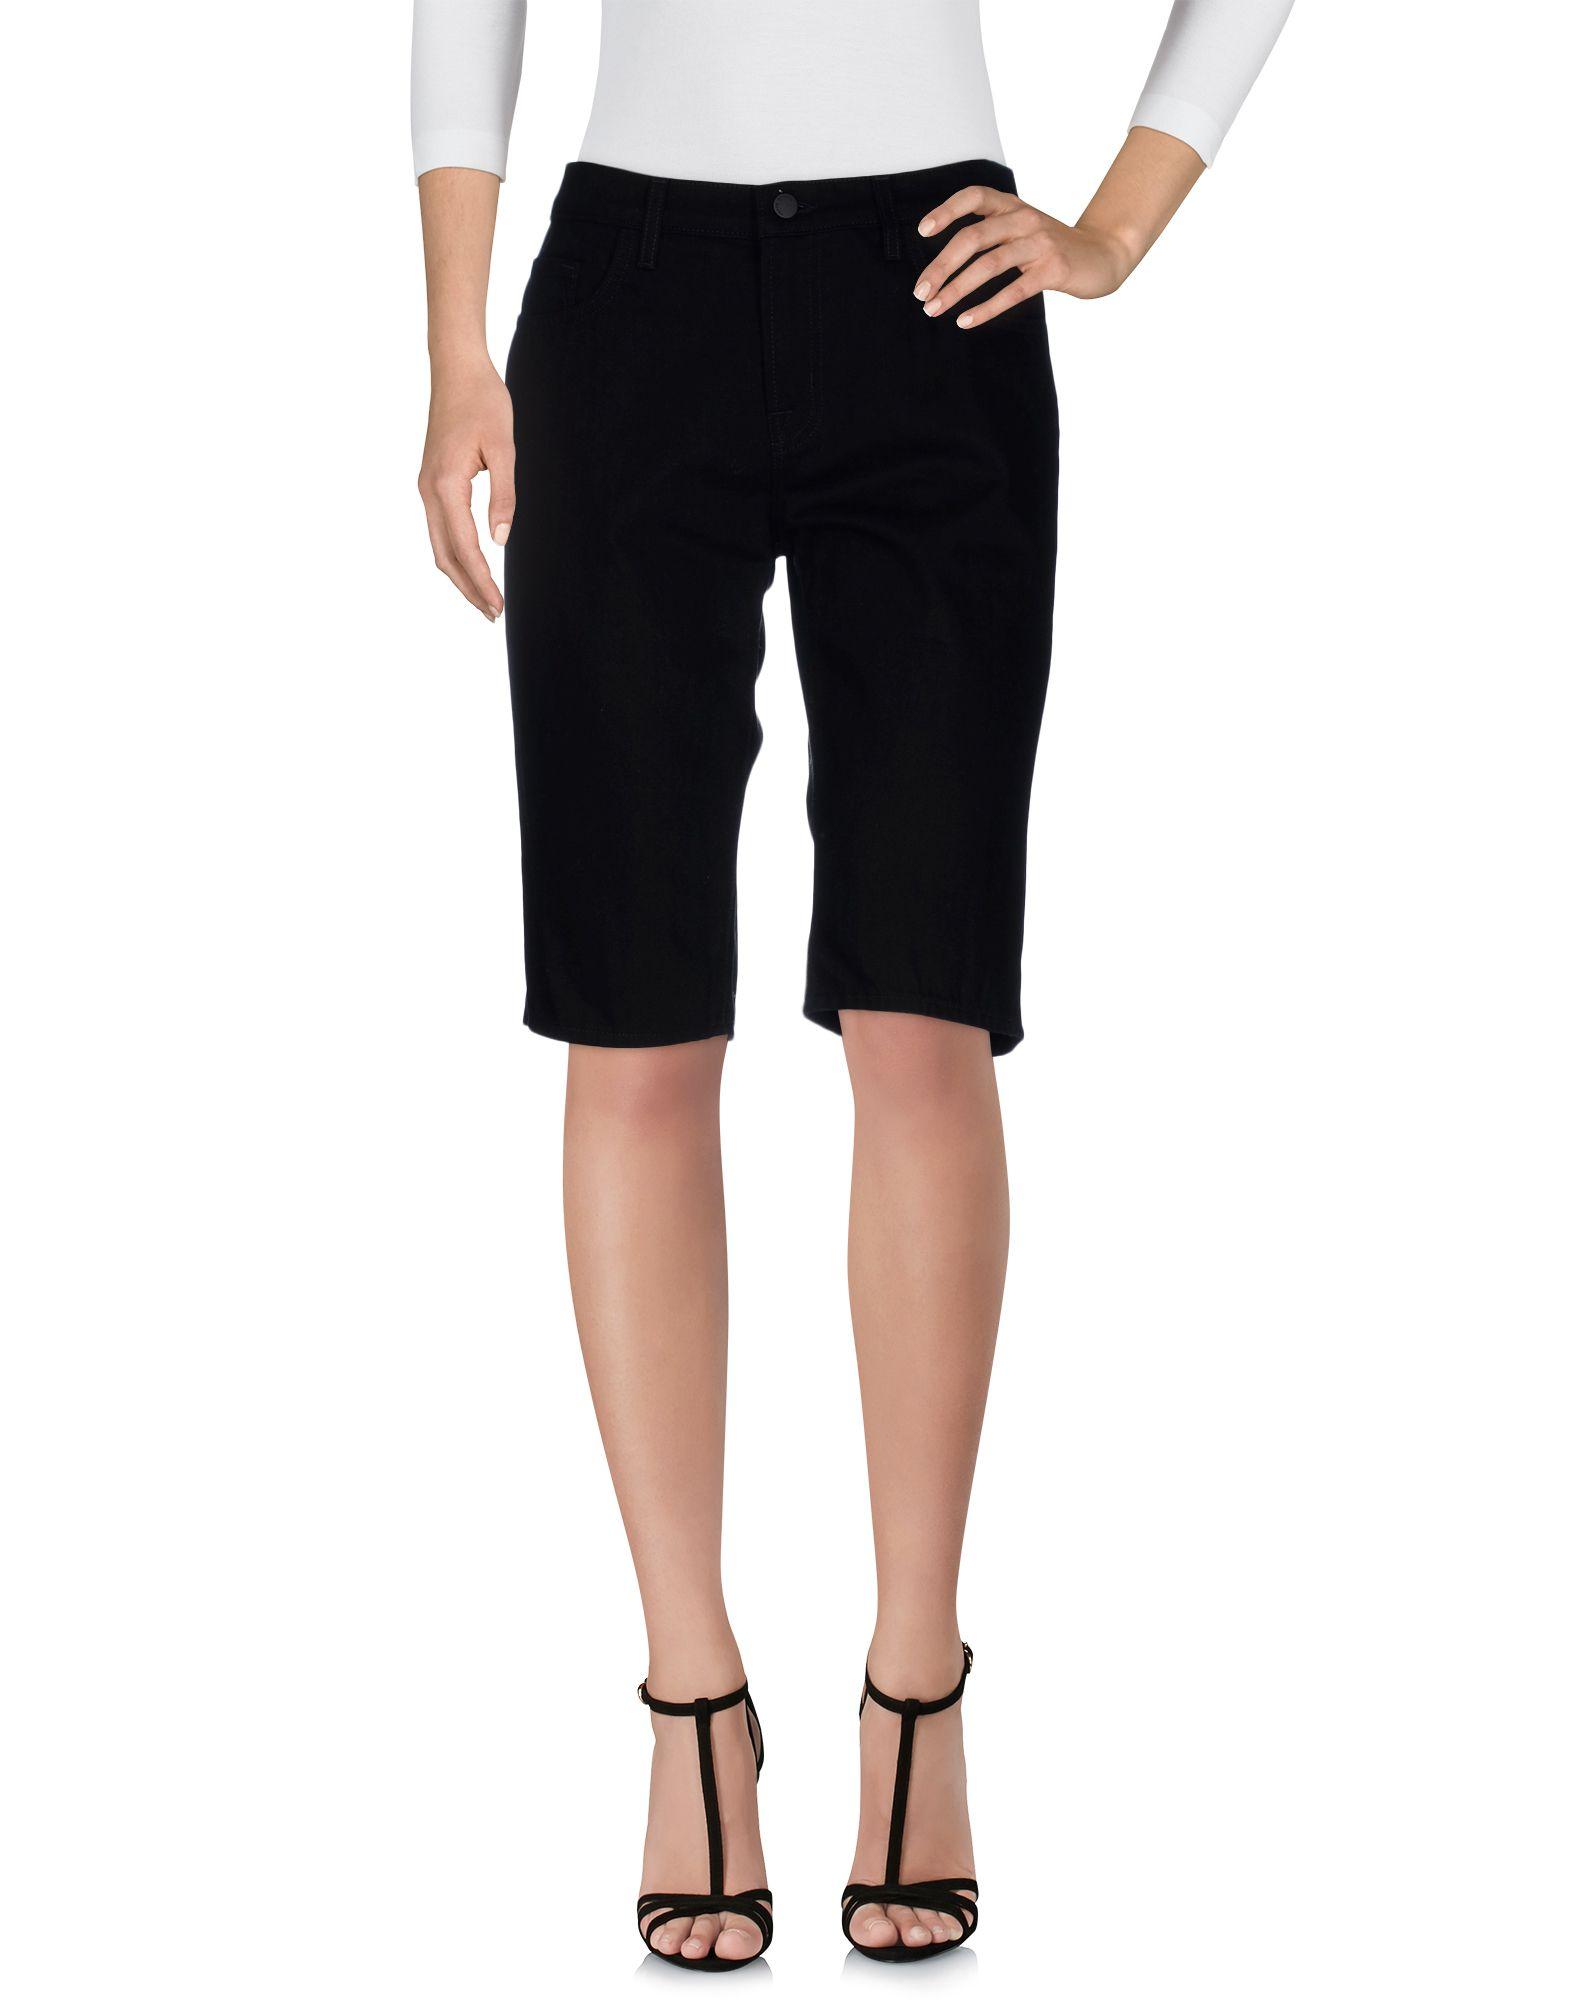 SIMONE ROCHA X J BRAND Denim Shorts in Black